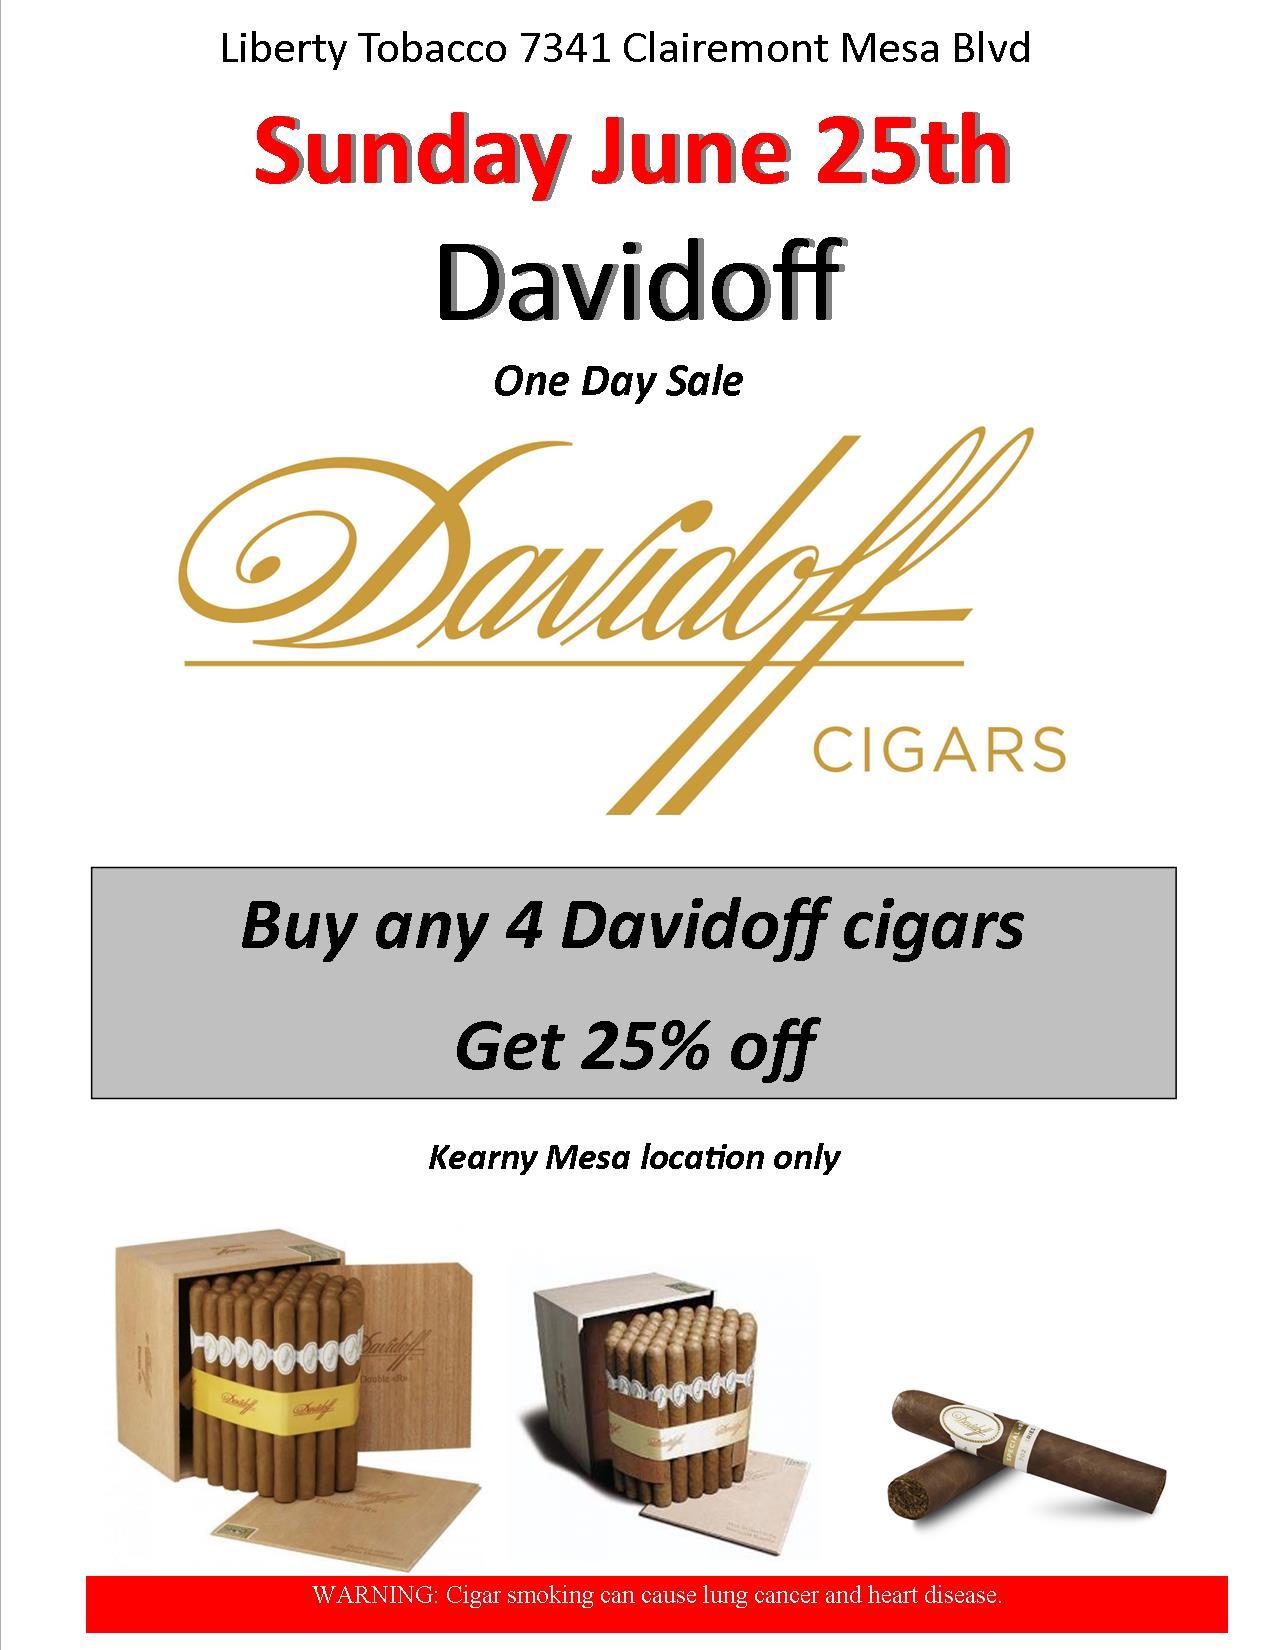 Davidoff One Day Sale at Kearny Mesa Location